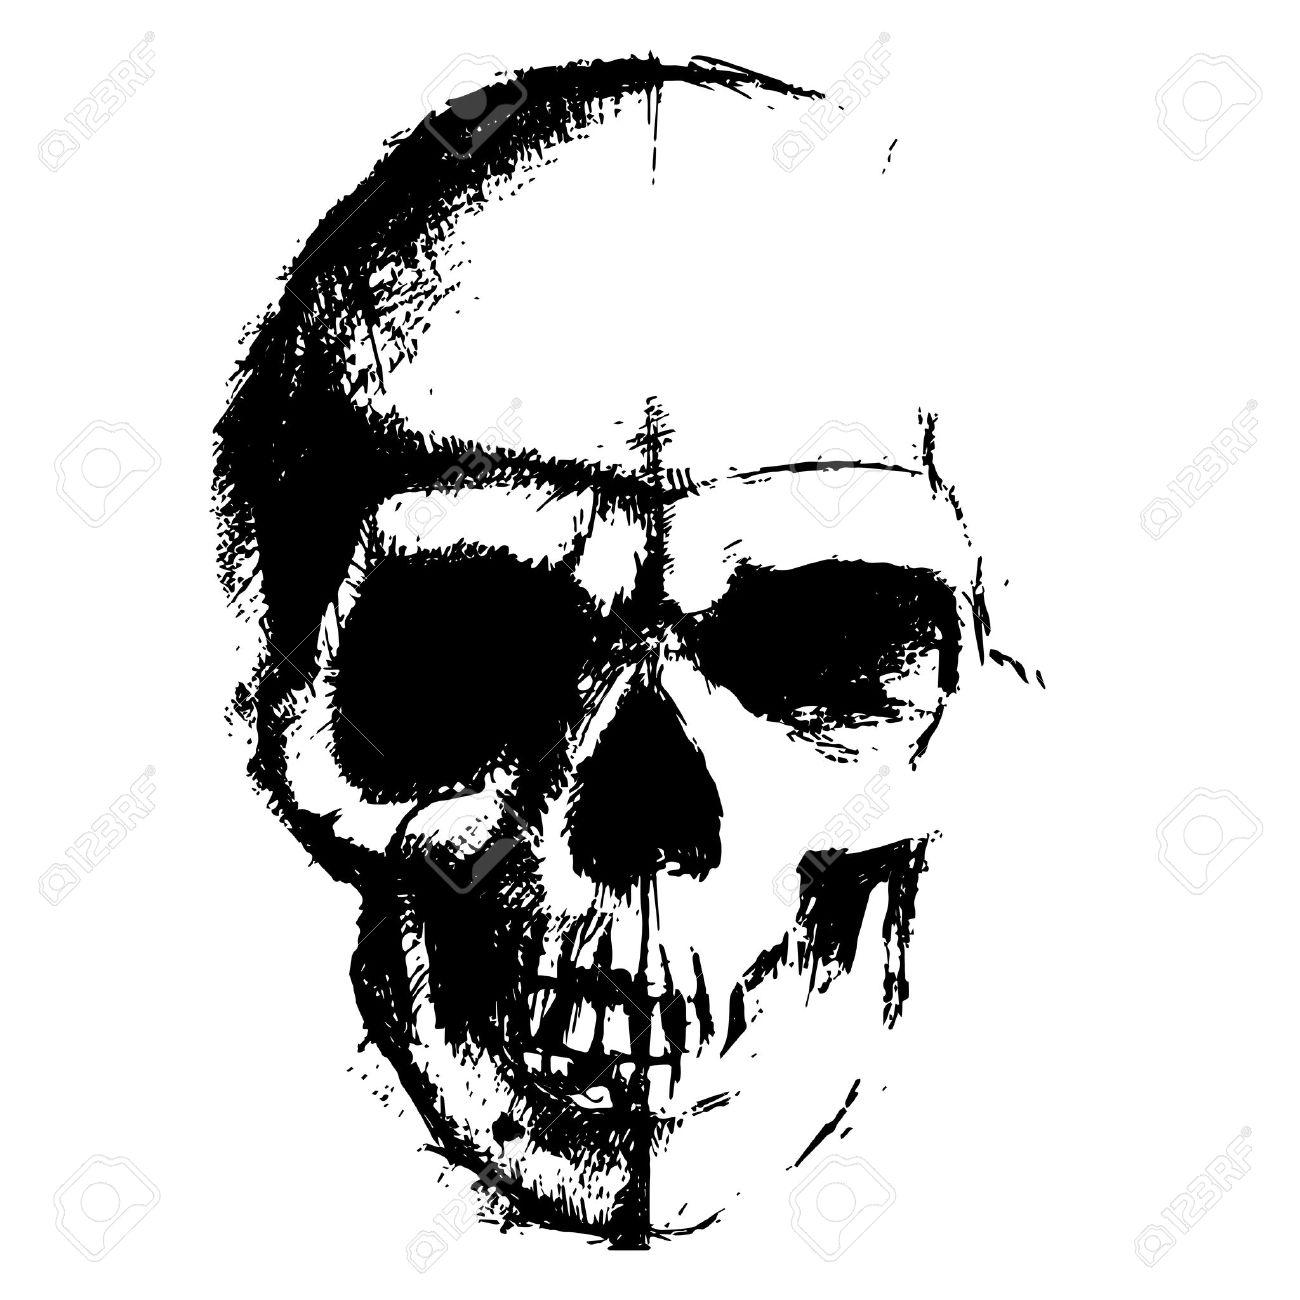 17,064 Evil Skull Stock Vector Illustration And Royalty Free Evil ...